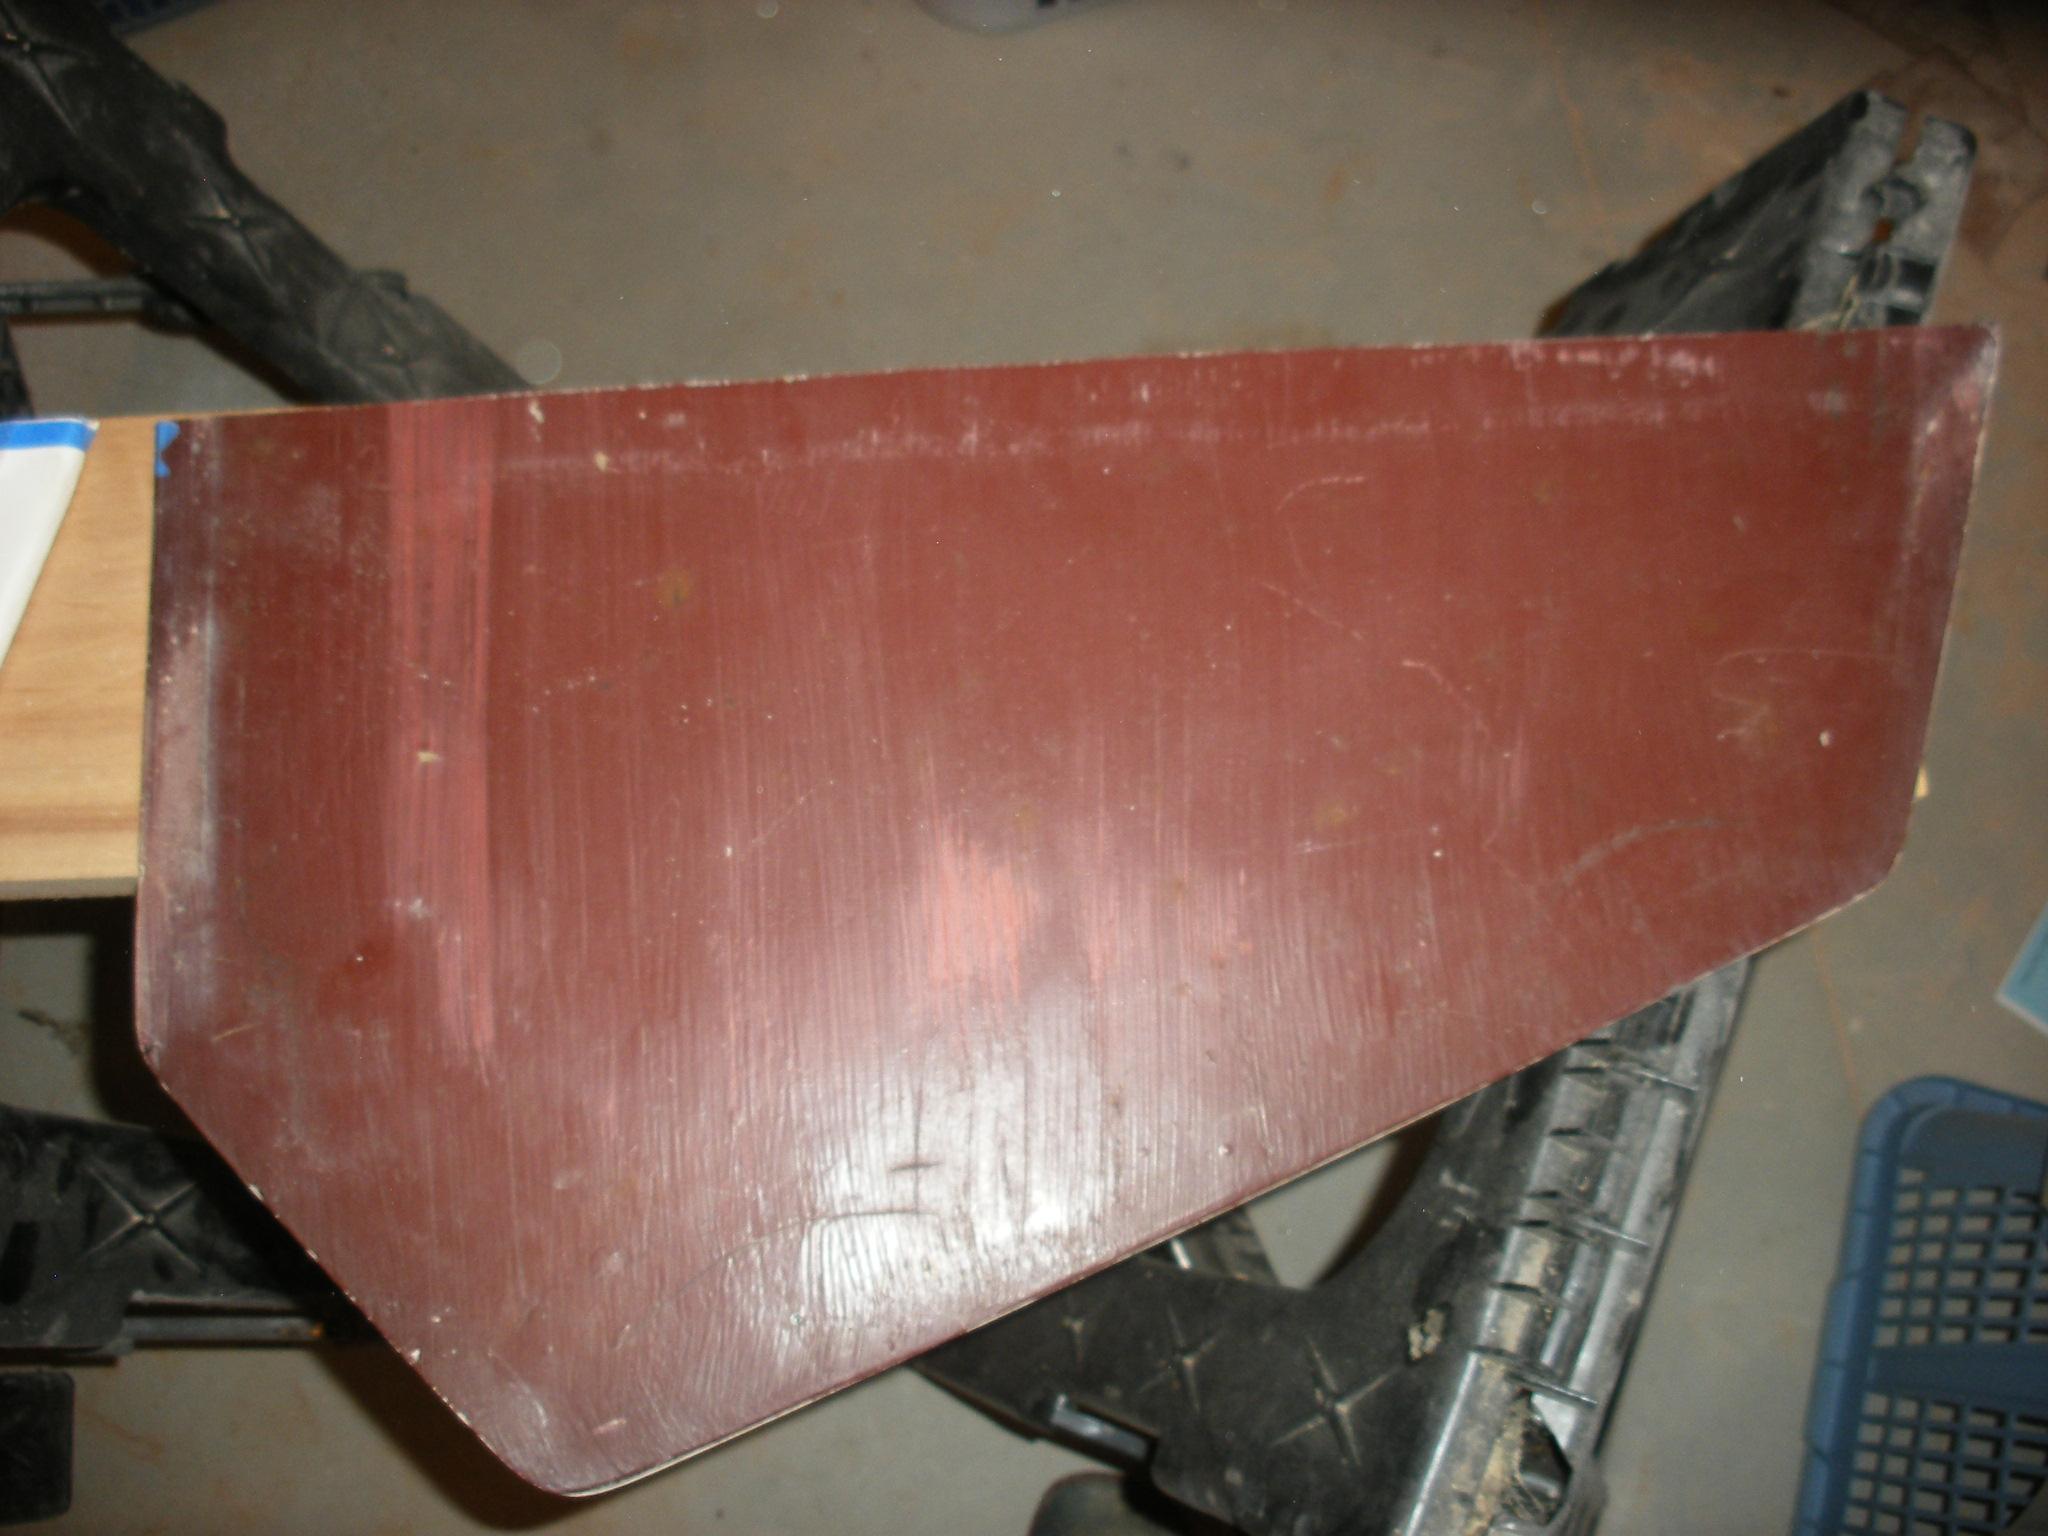 Bottom of hatch after cut.